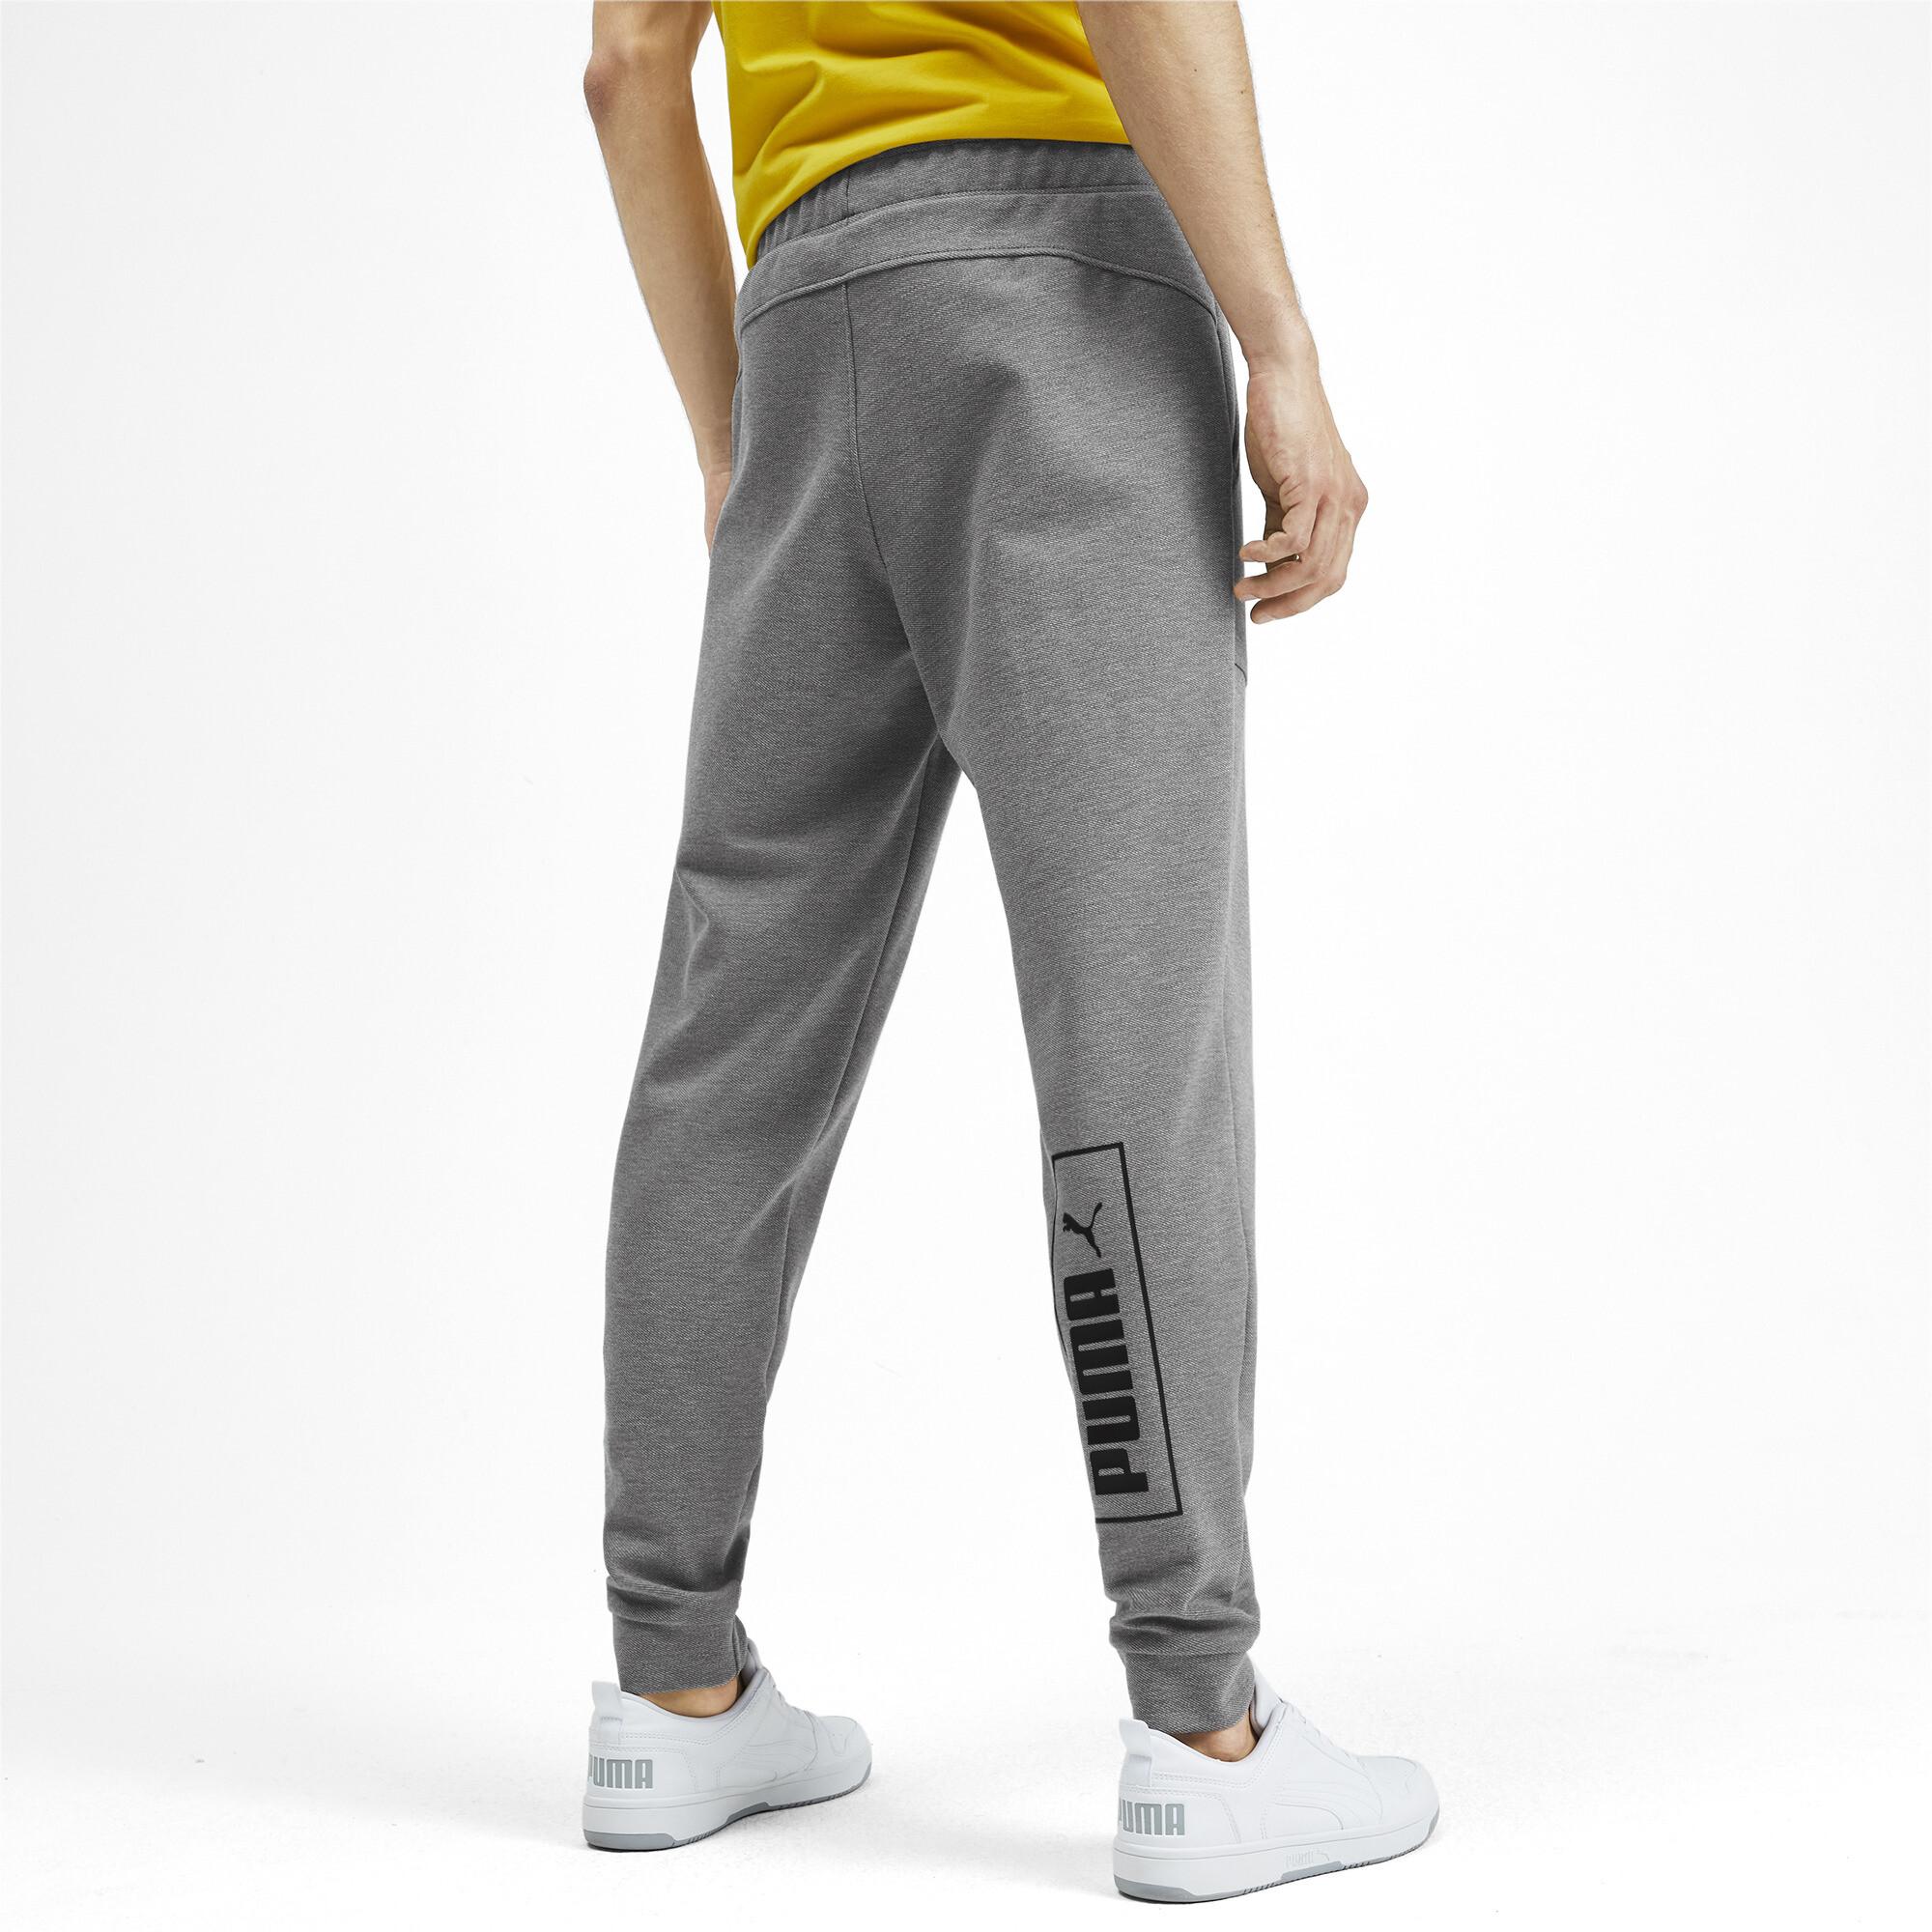 PUMA-NU-TILITY-Men-039-s-Sweatpants-Men-Knitted-Pants-Basics thumbnail 5